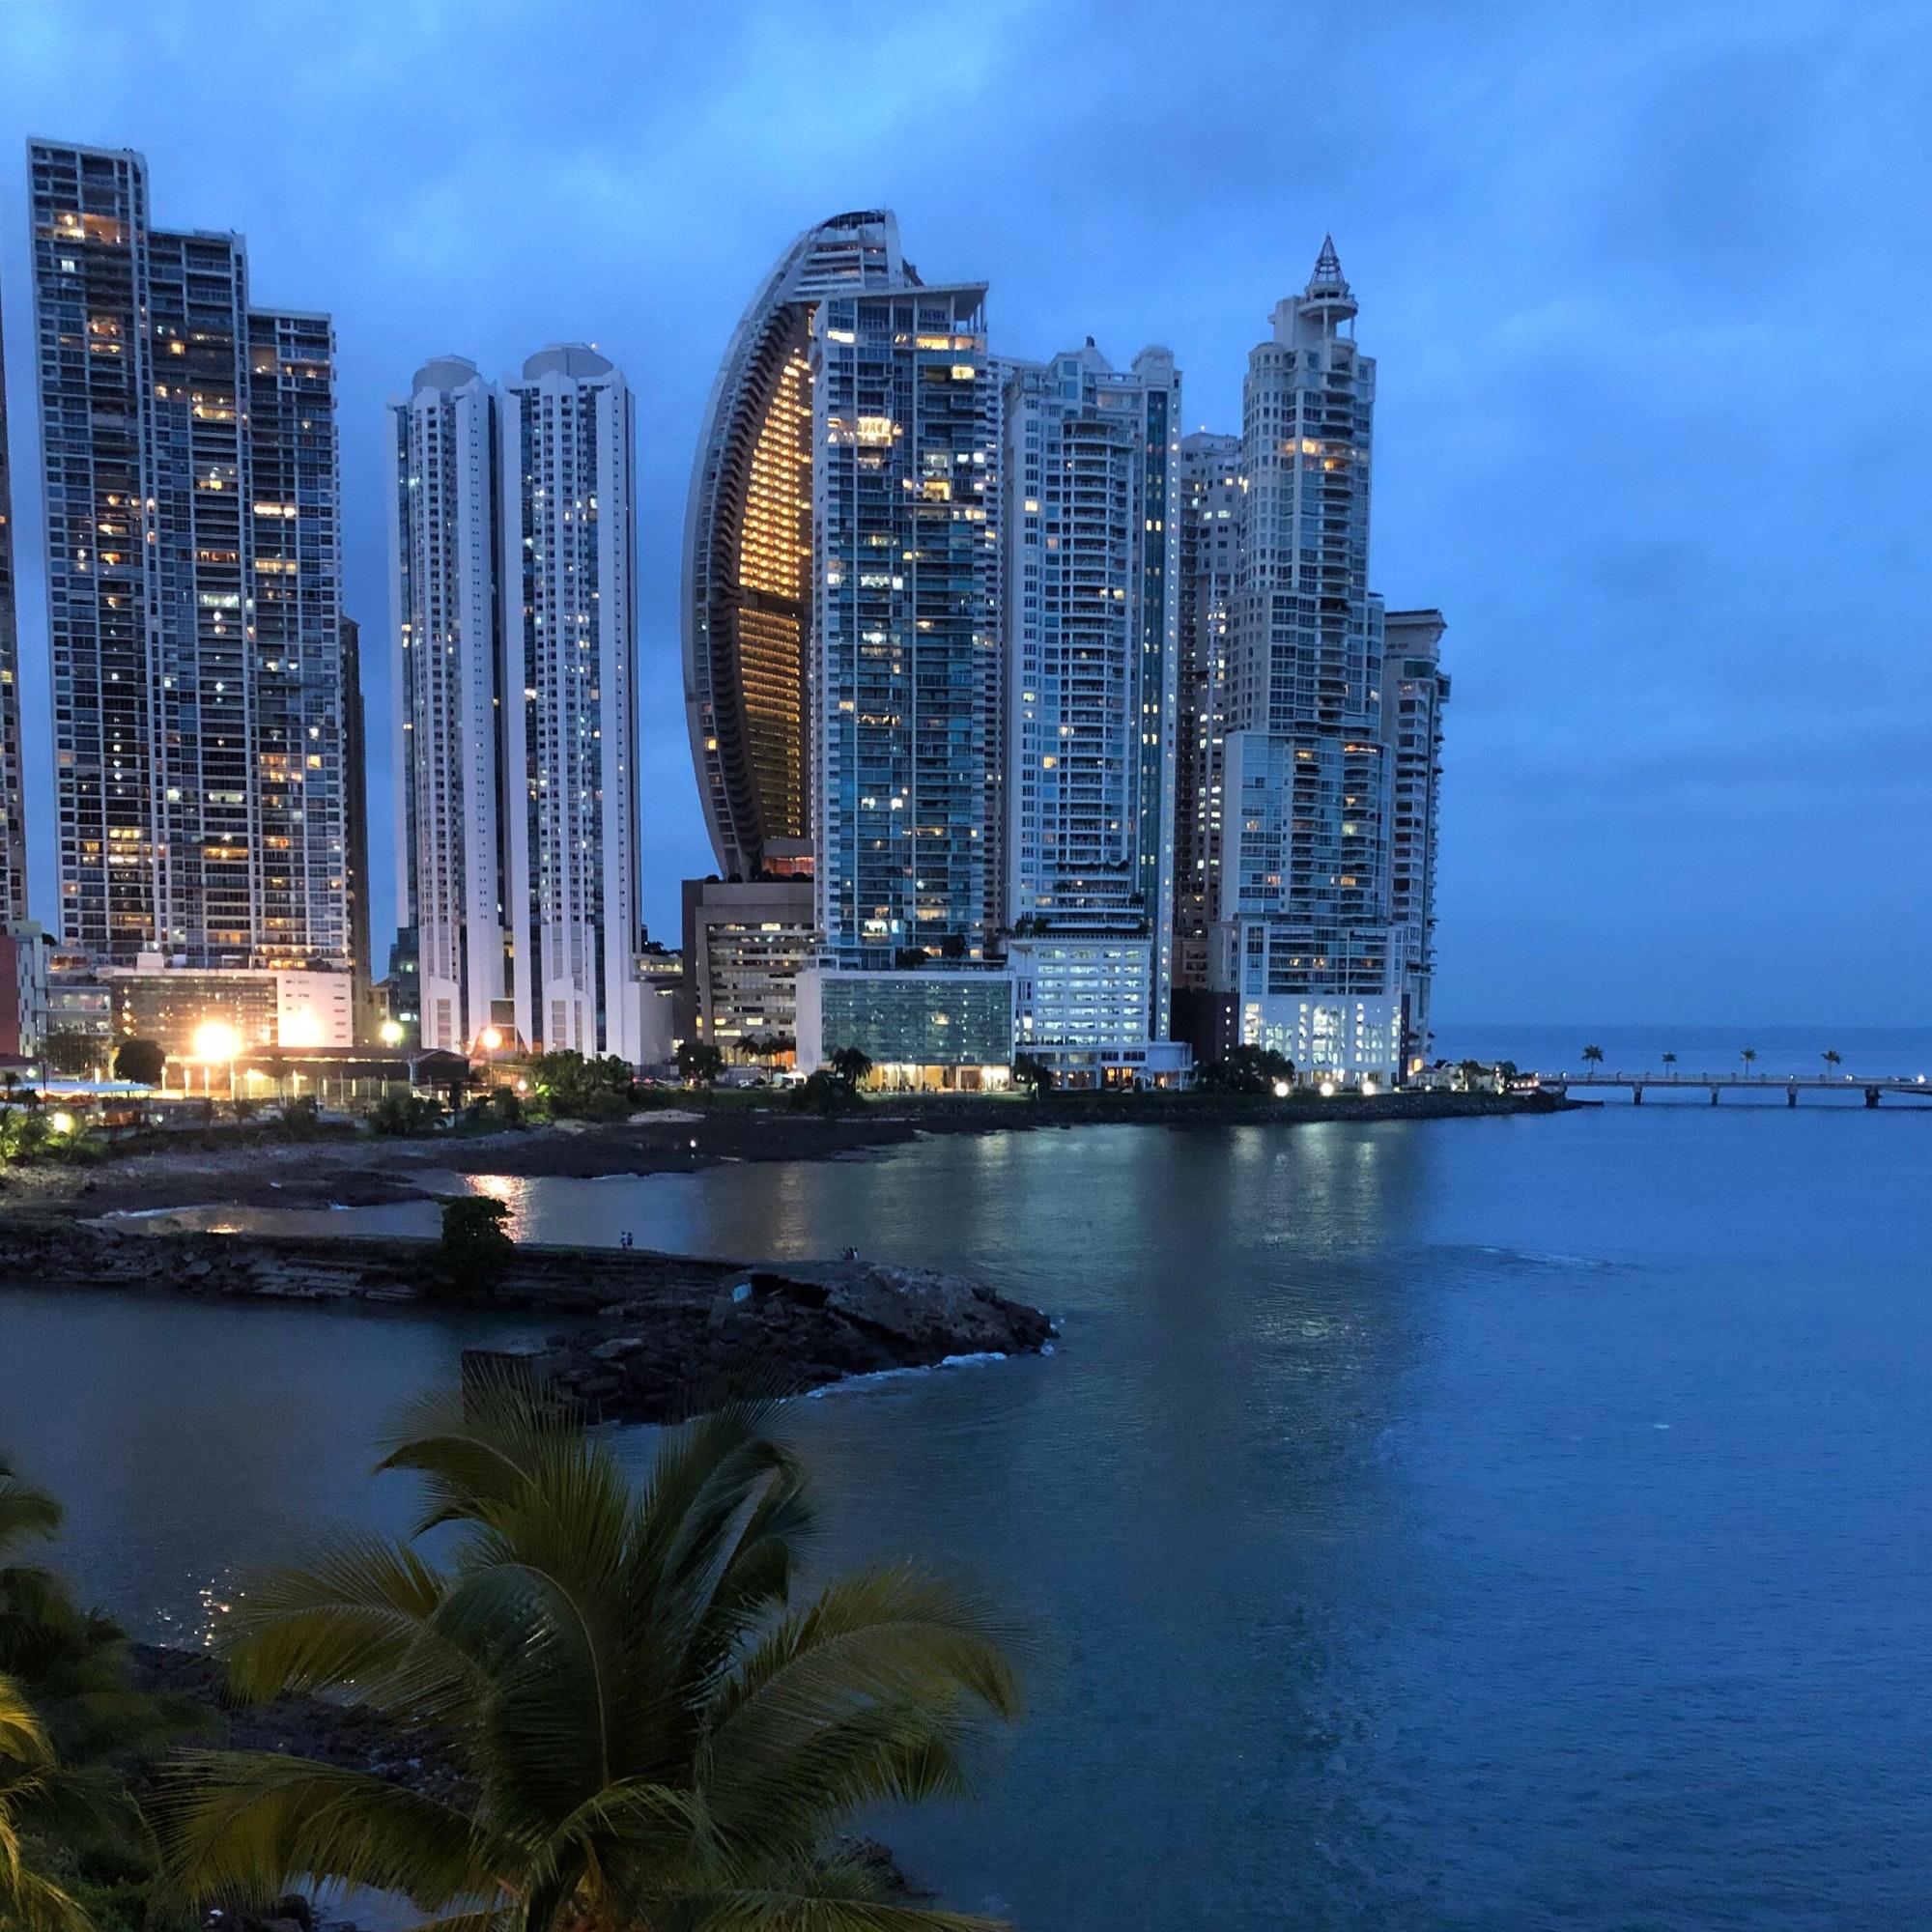 Panama City Skyline at dusk